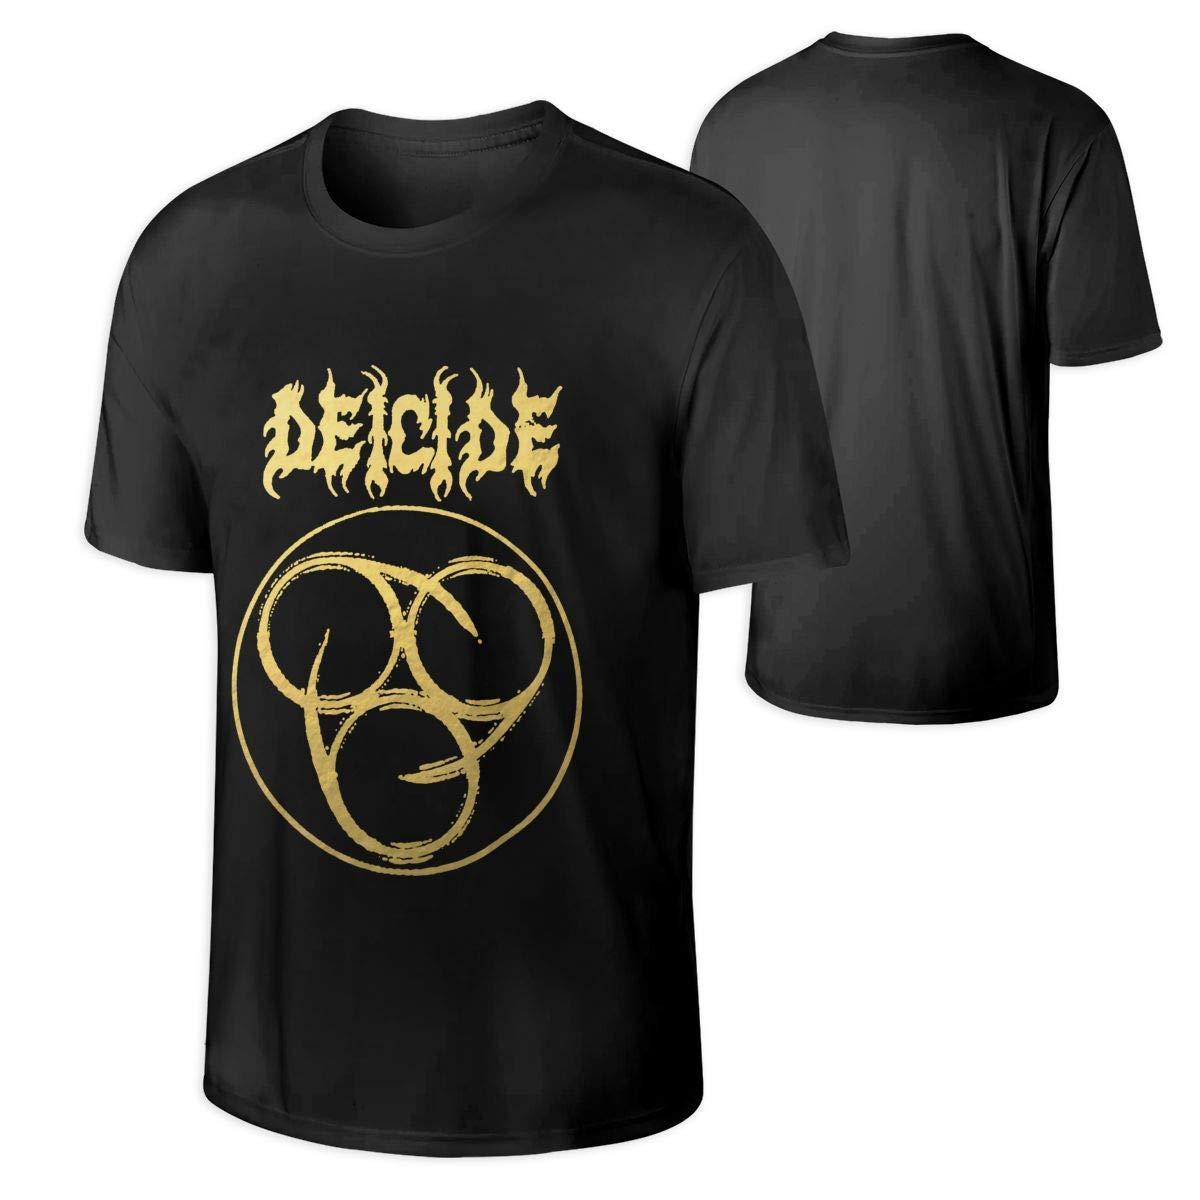 Deicide Music Band Aid Tee Gift Shirts